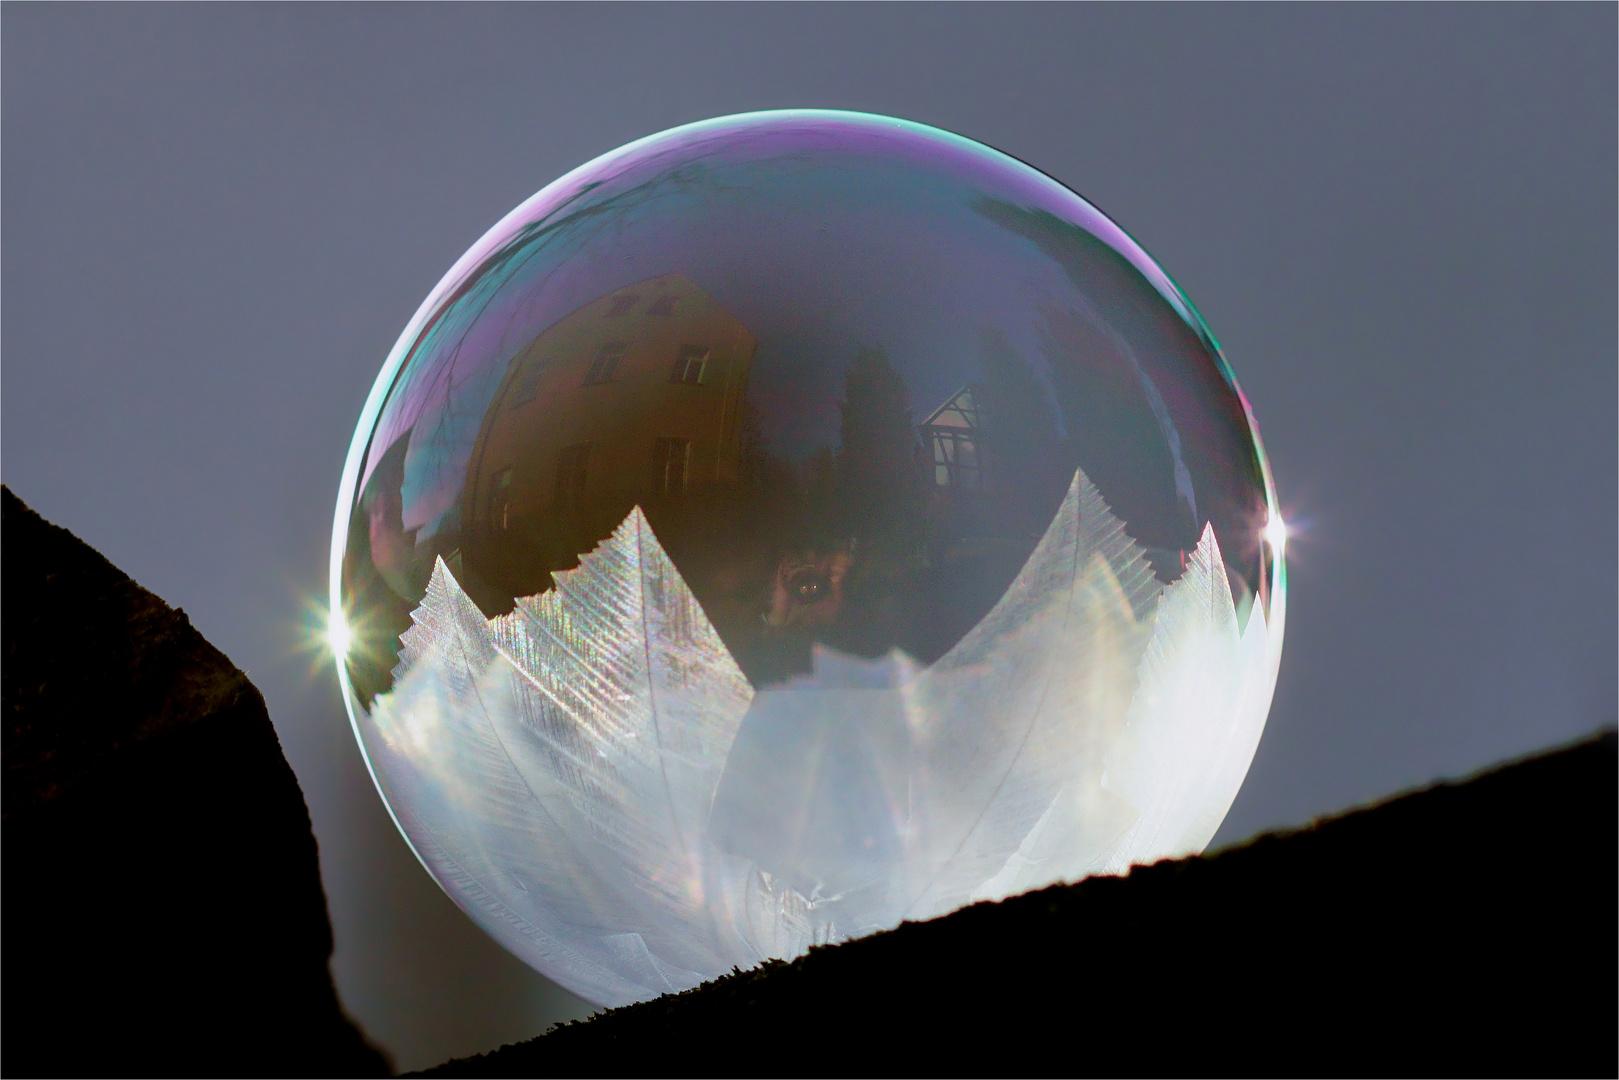 Die Exquisite - halb gefrorene Seifenblase